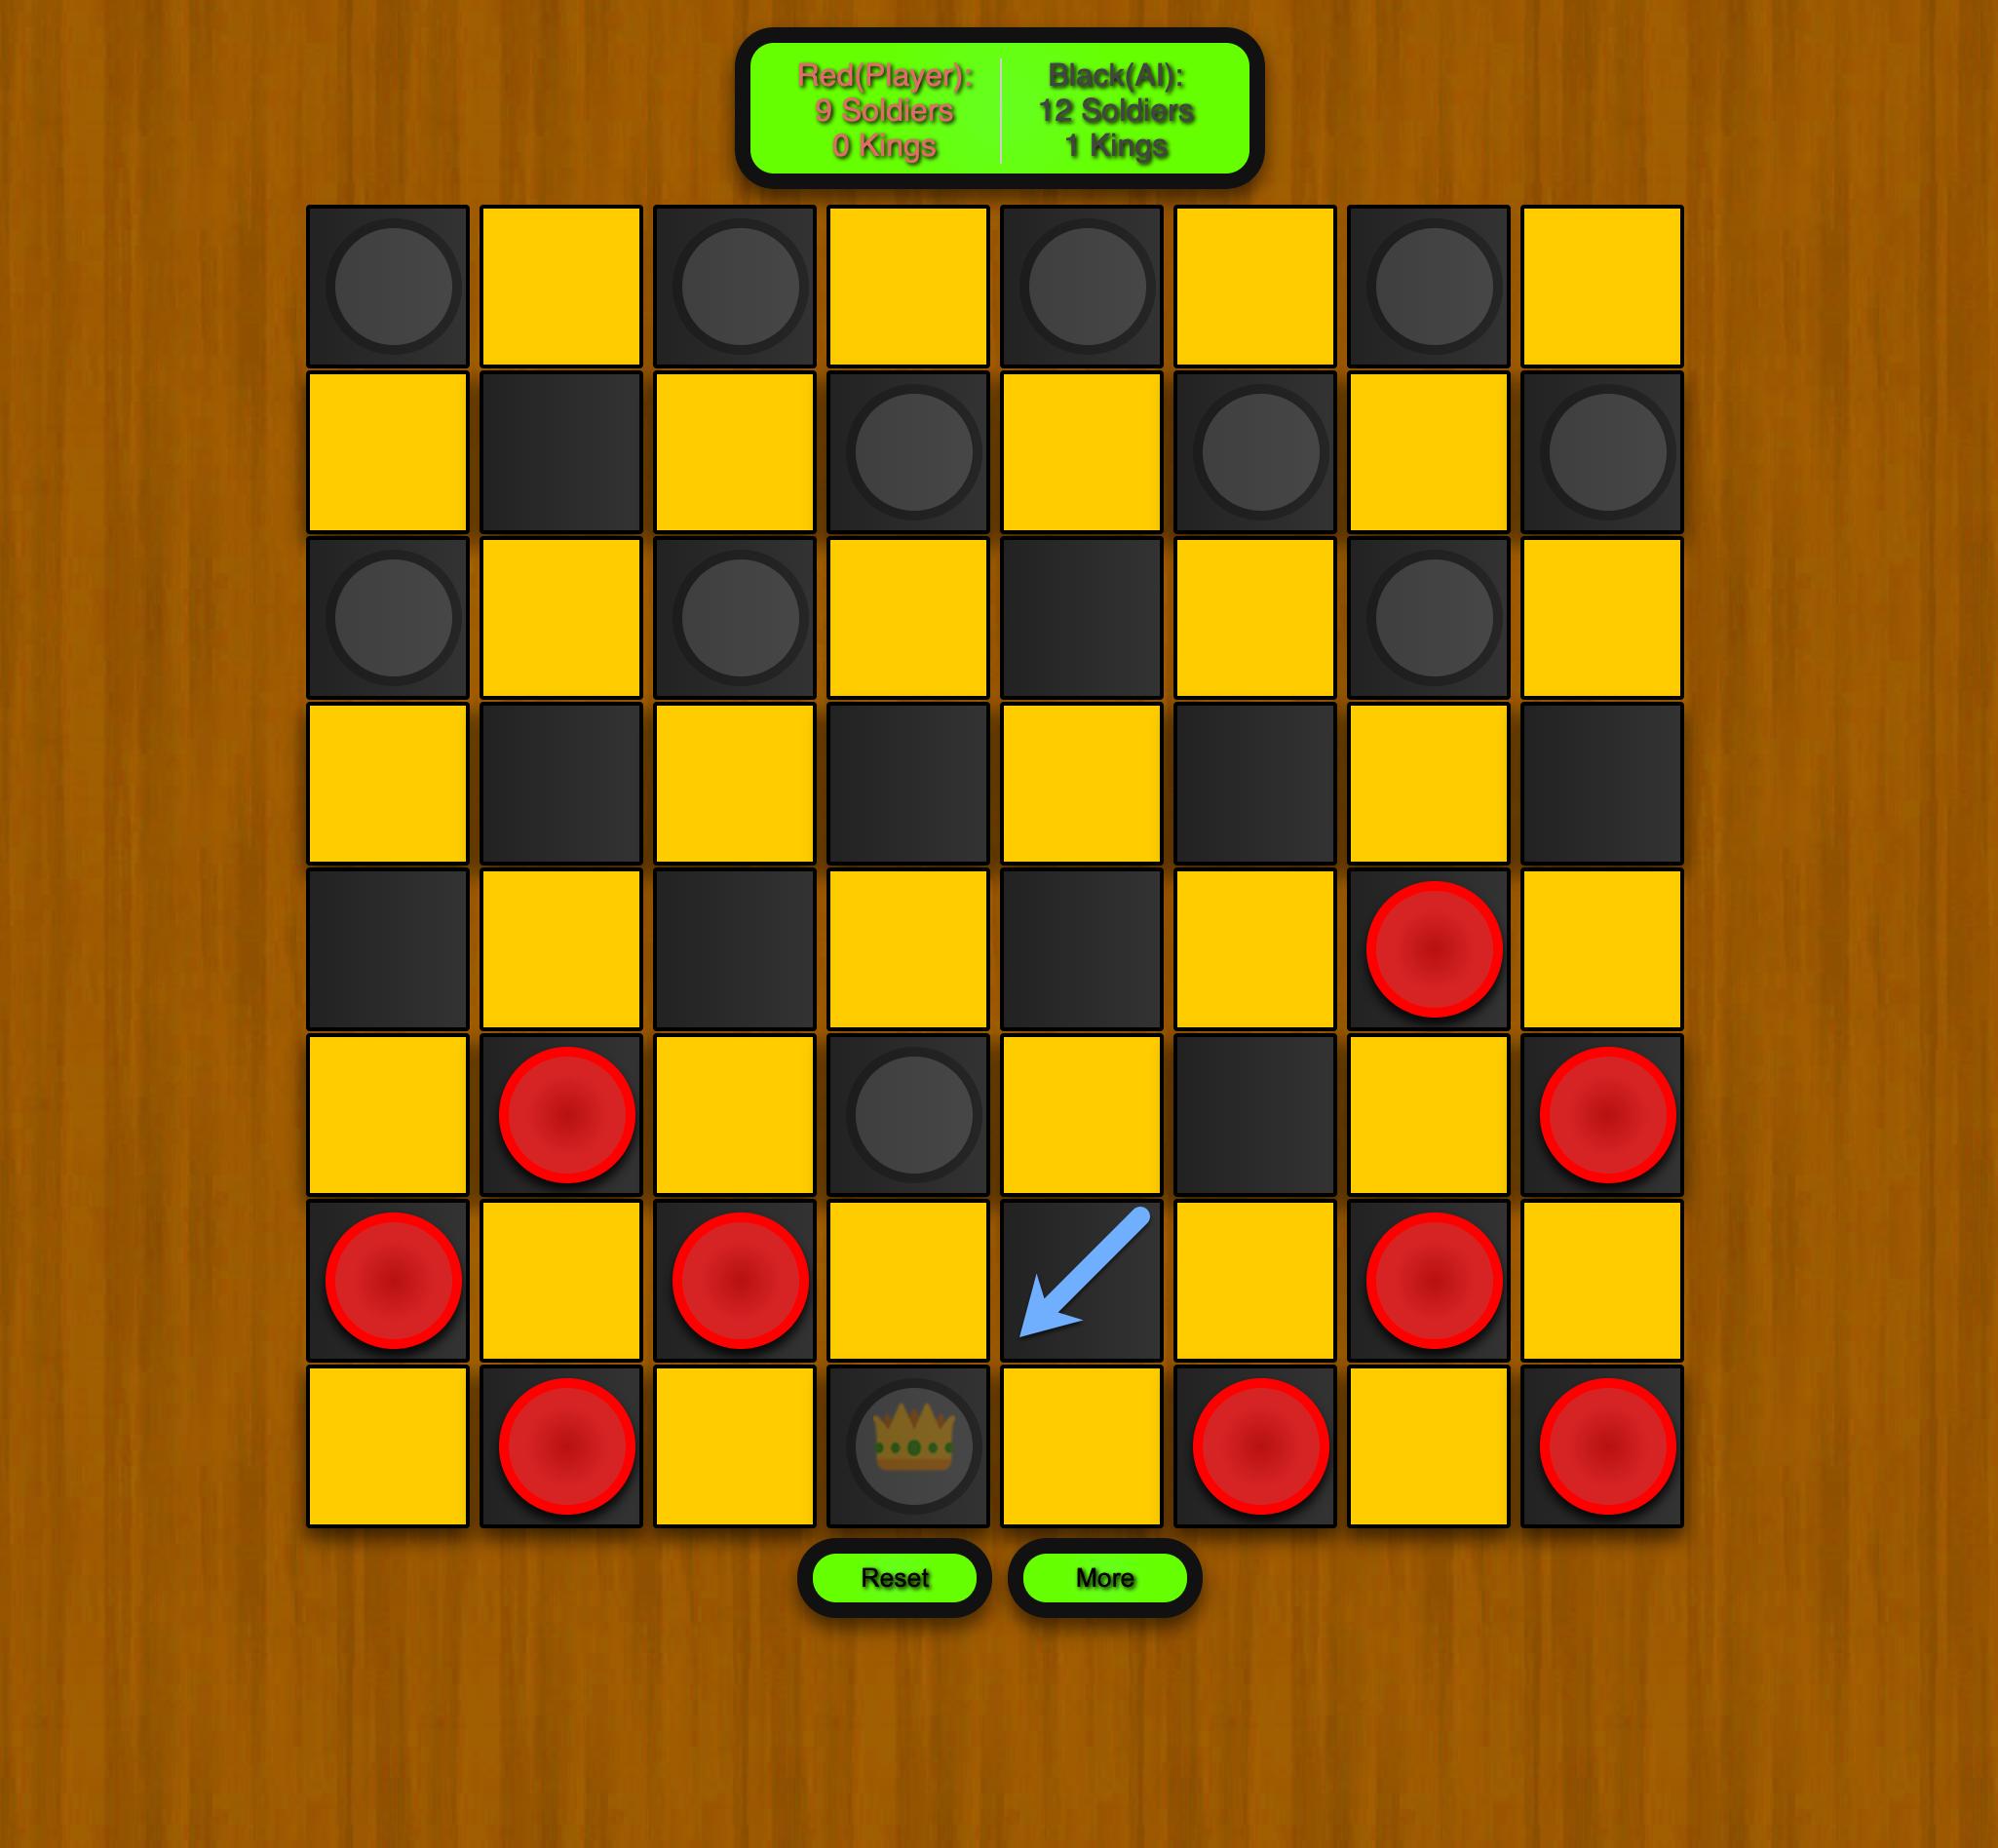 Free Checkers Game Online Black King Screen Screenshot.